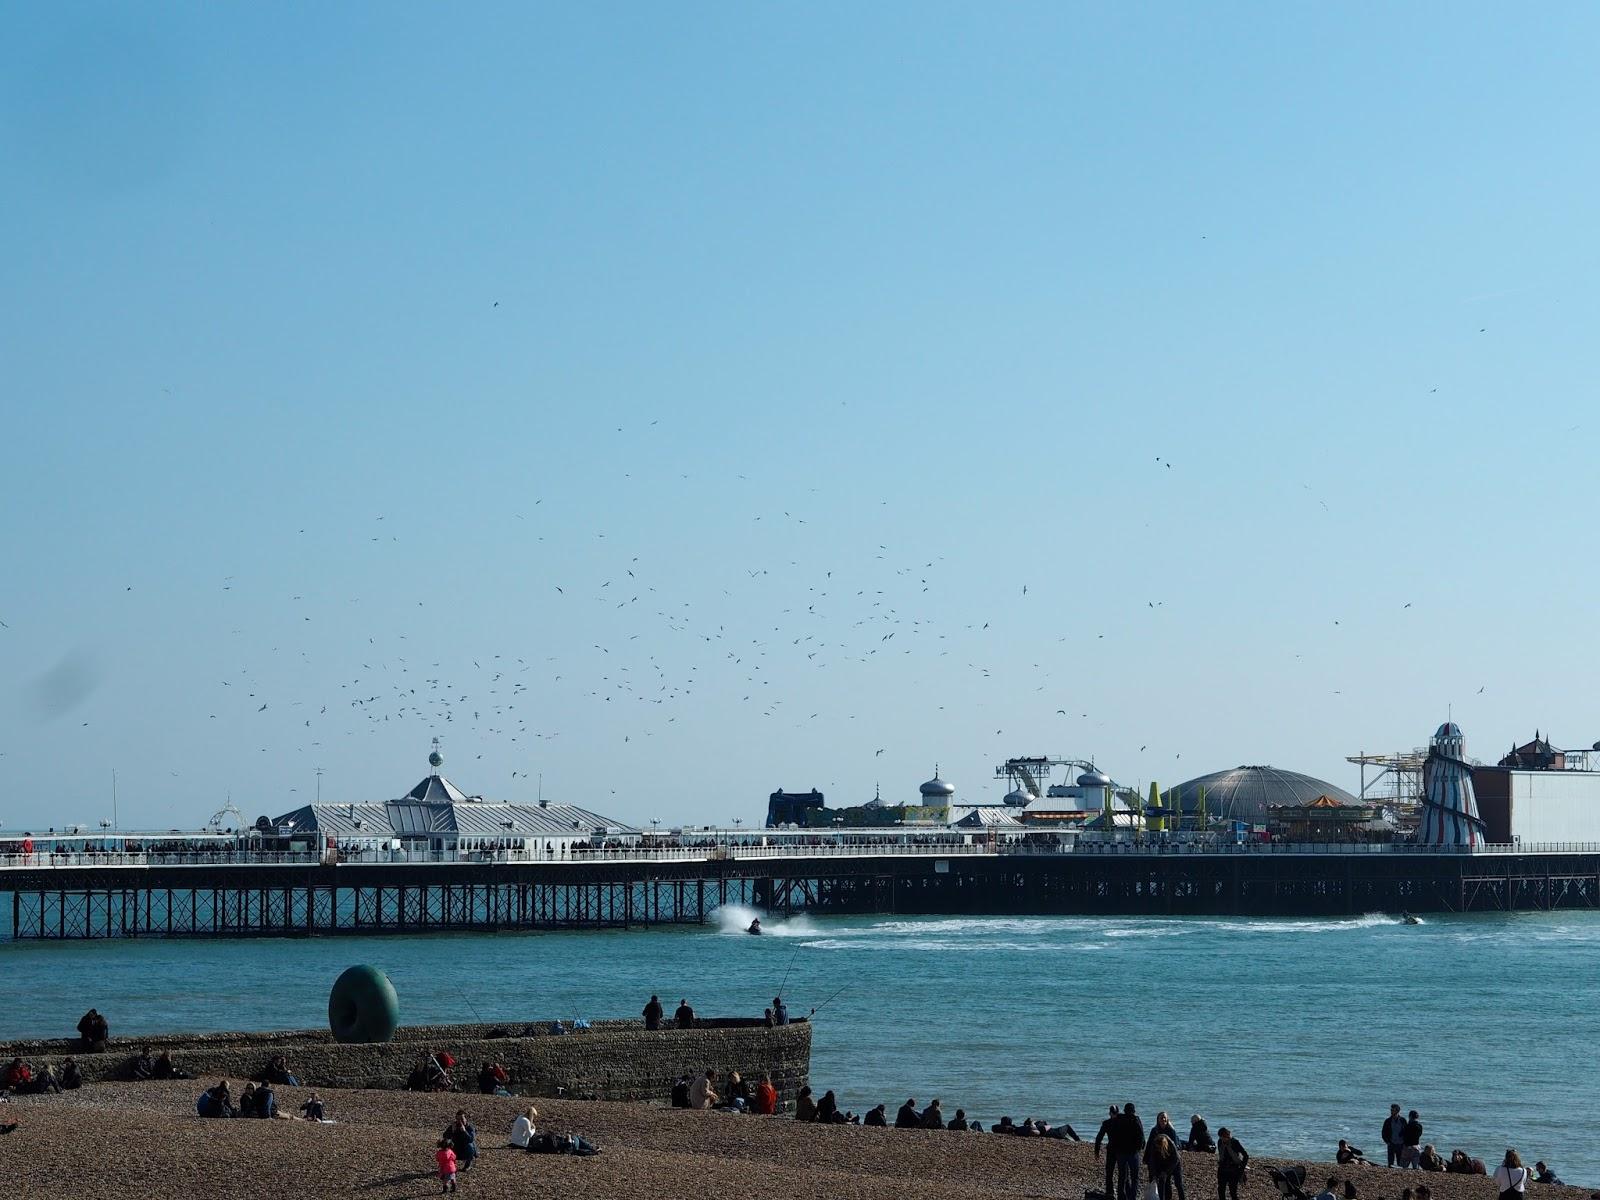 Brighton Pier & flock of birds